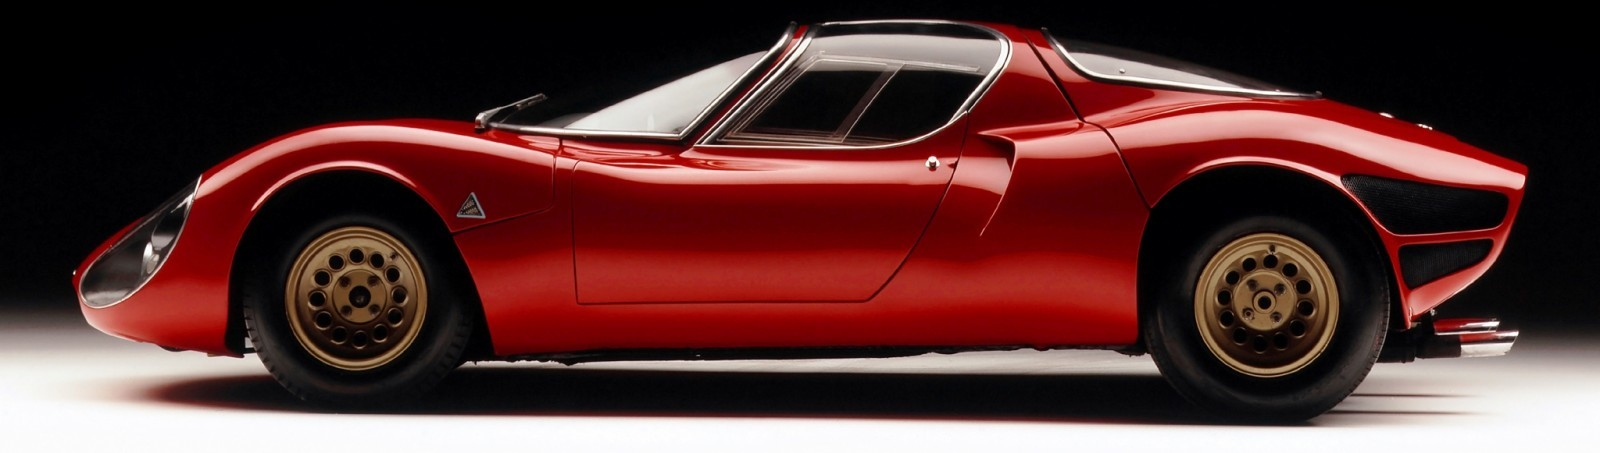 Alfa-Romeo-Tipo-33-Stradale-Prototipo-1967-7